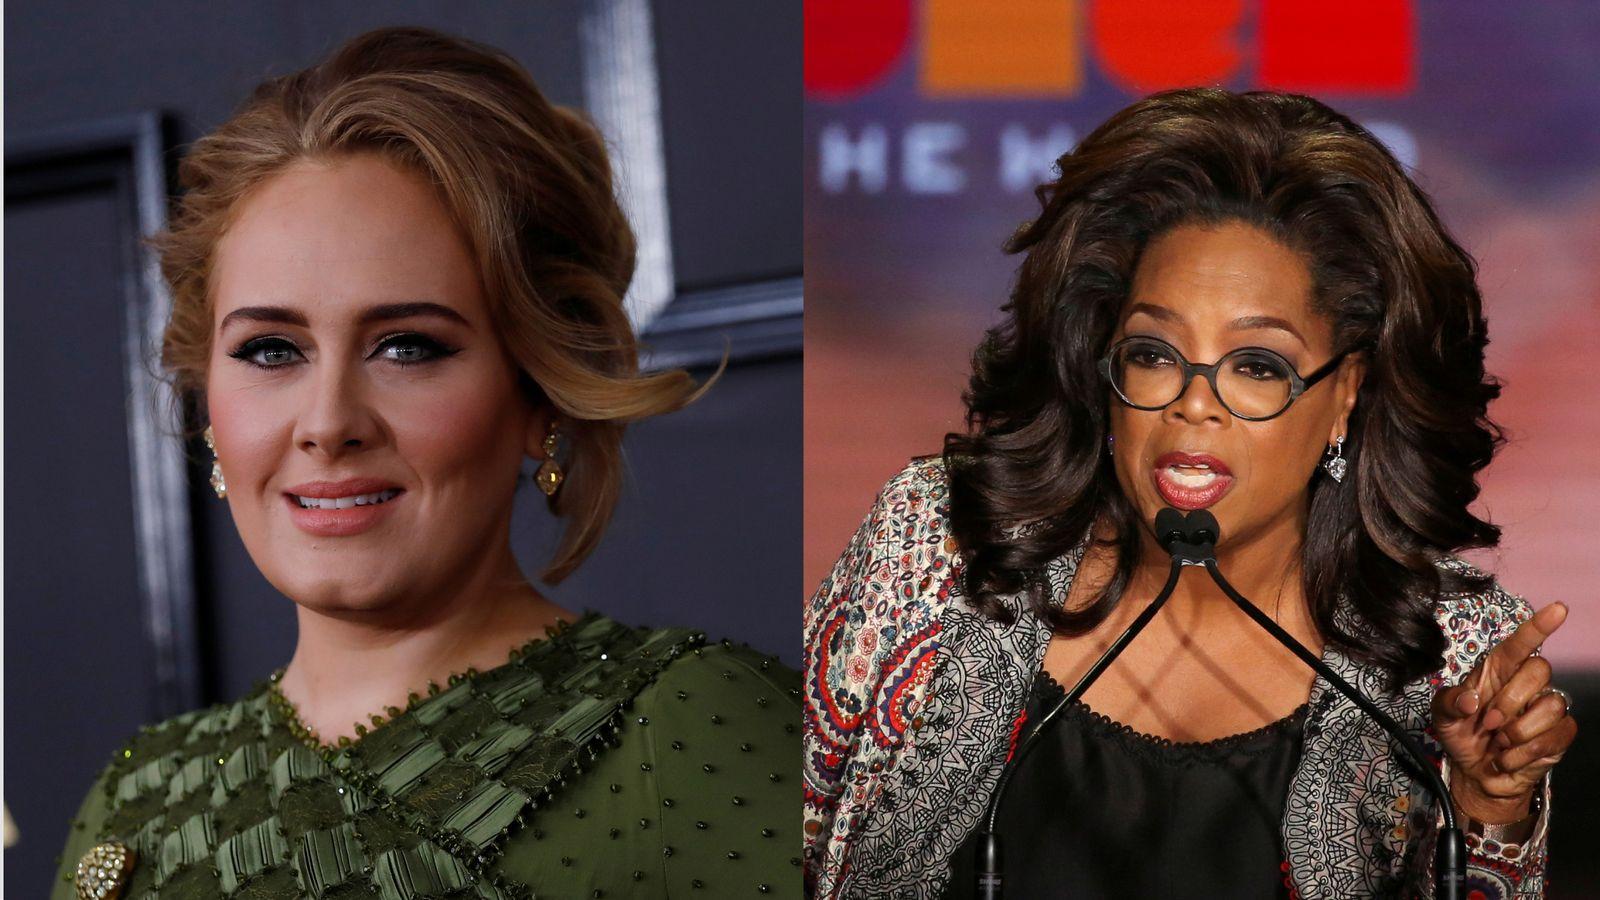 Adele album: Oprah Winfrey to interview British star in two-hour special